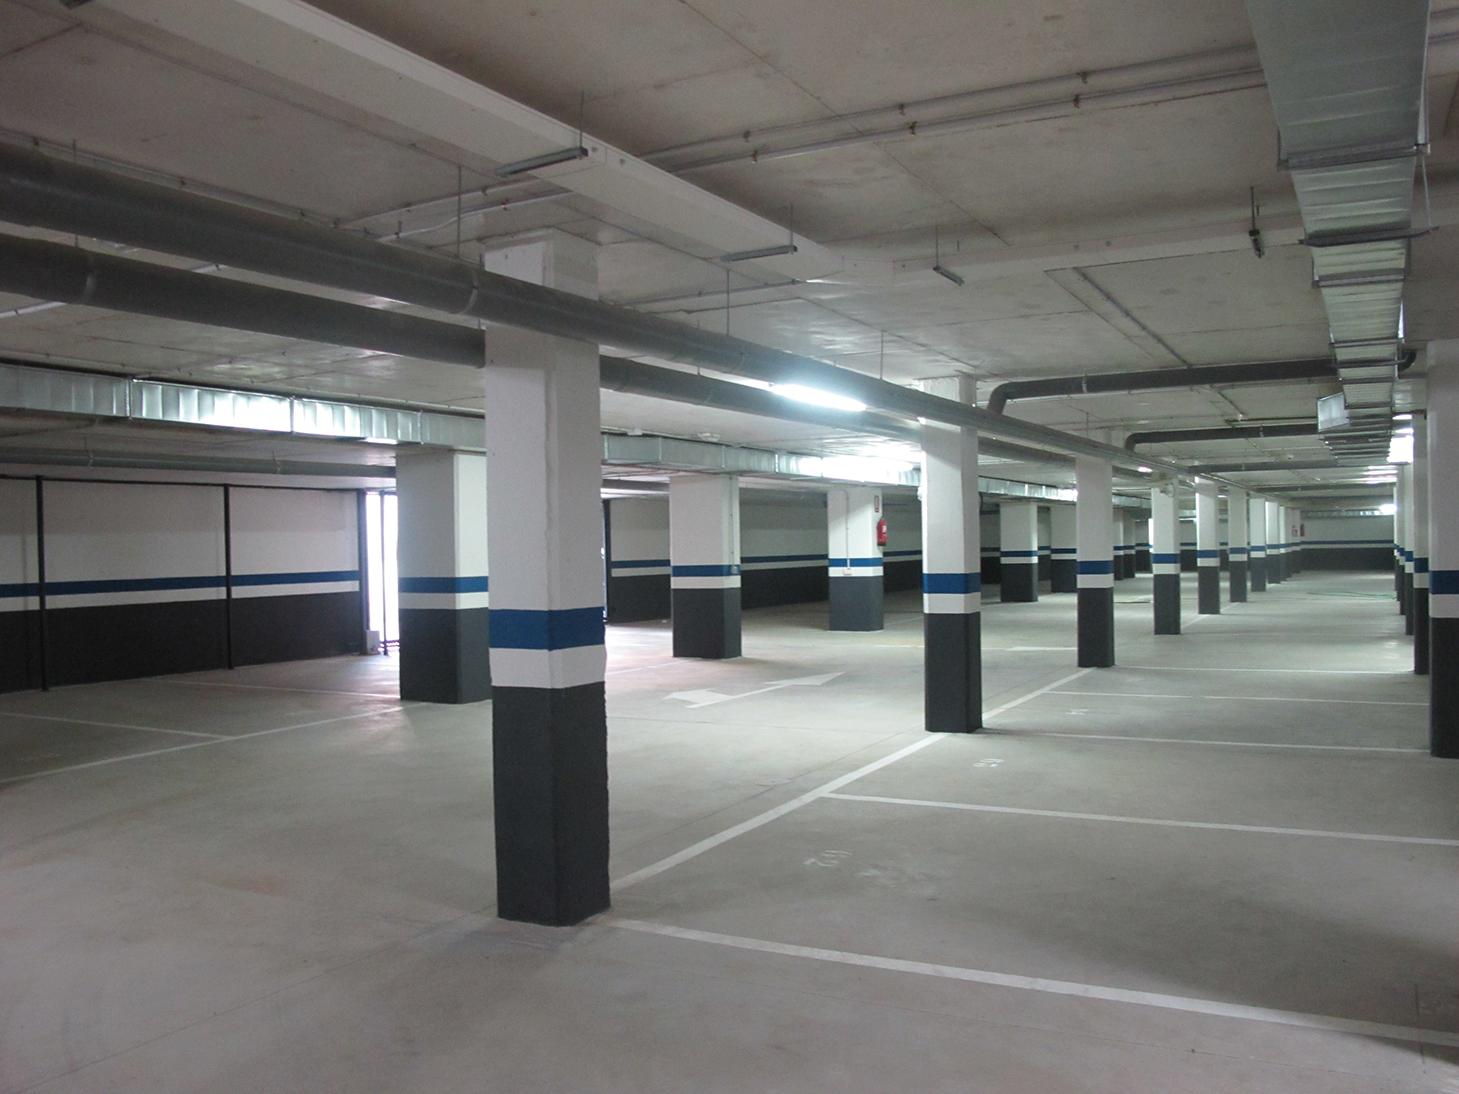 Alquiler de plazas de garaje en sevilla for Alquiler de particulares en sevilla